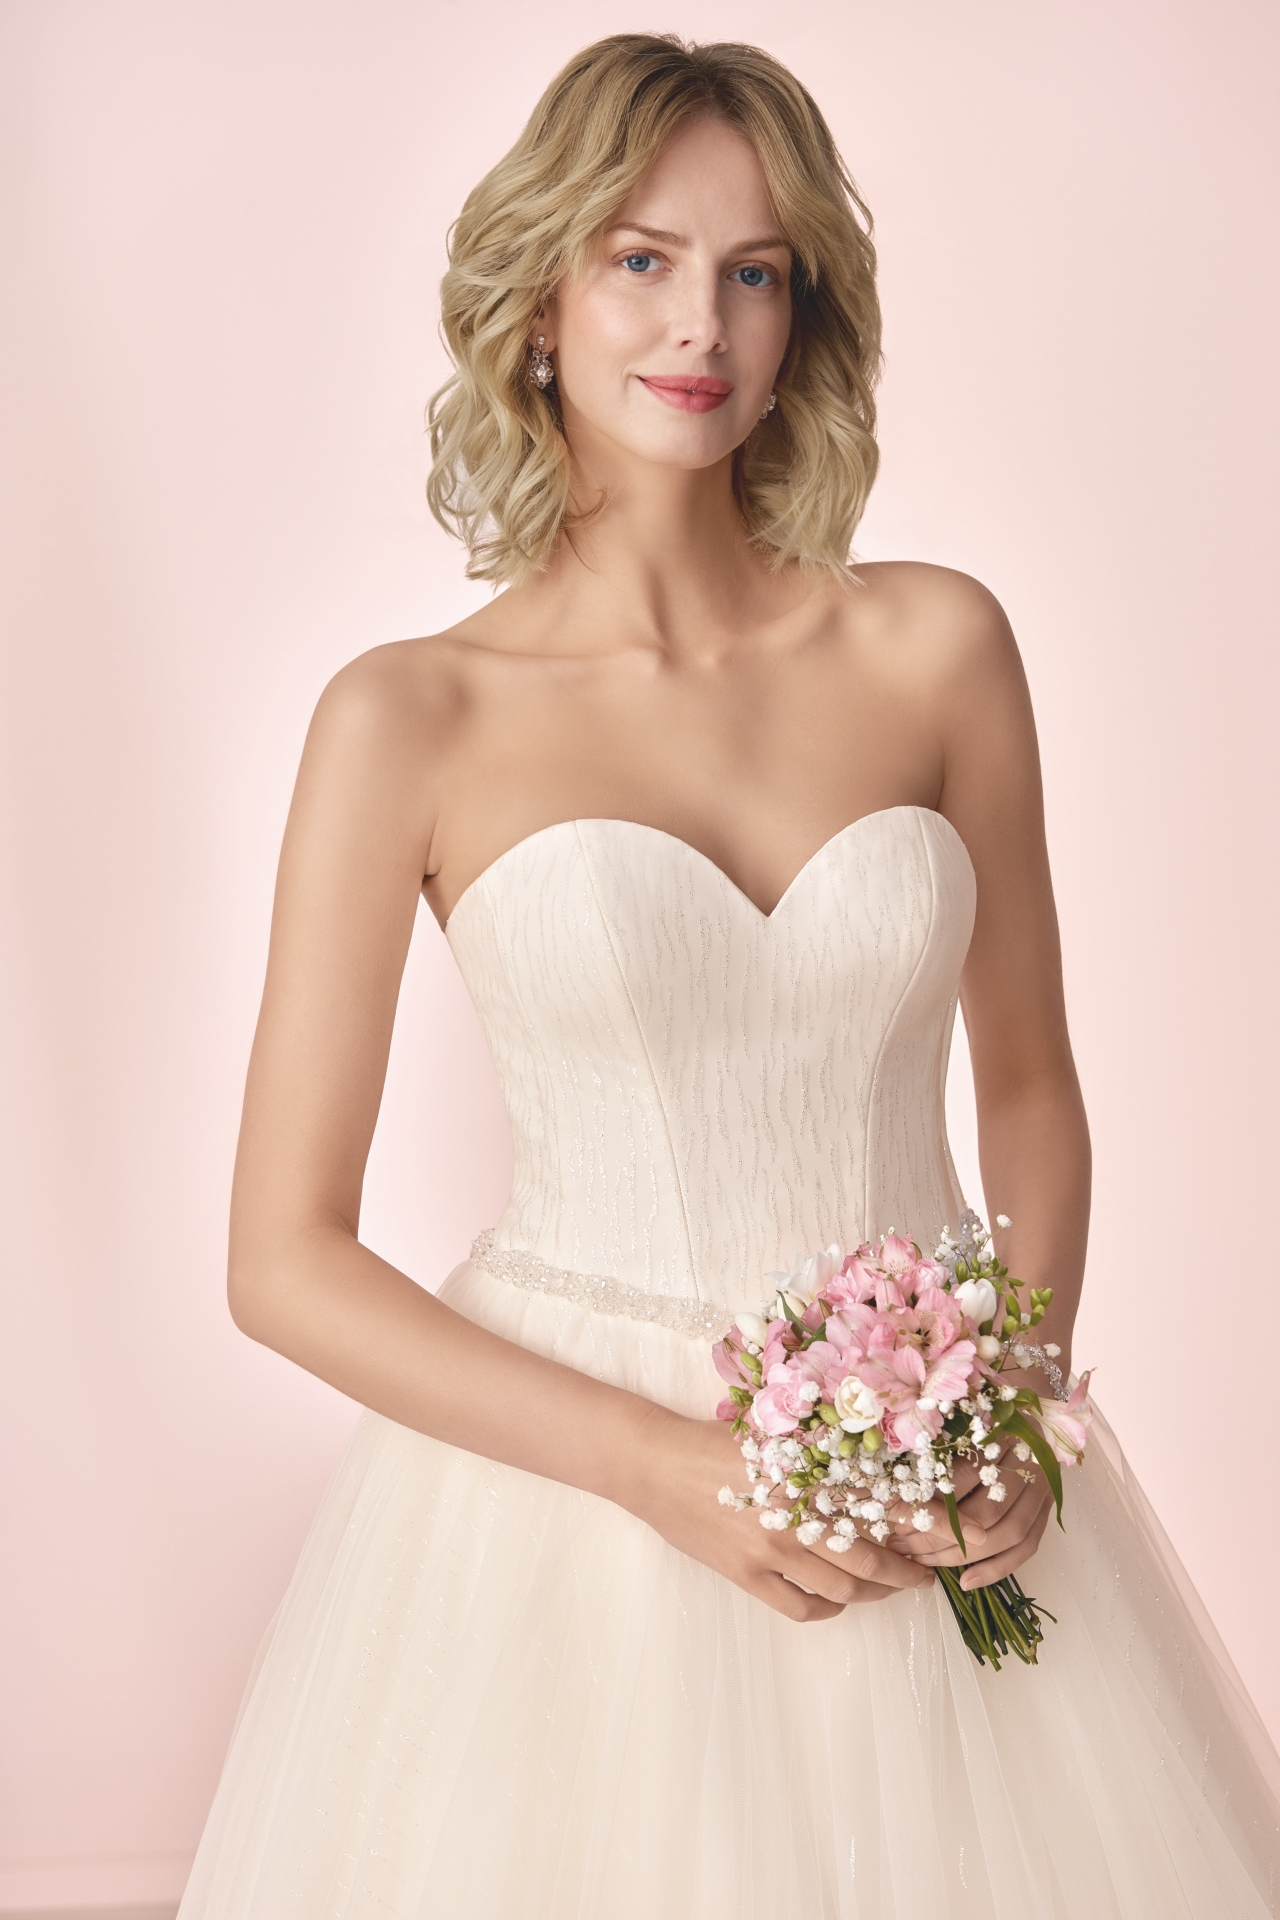 Brautkleid Elizabeth Konin 2019 - 4160T-0